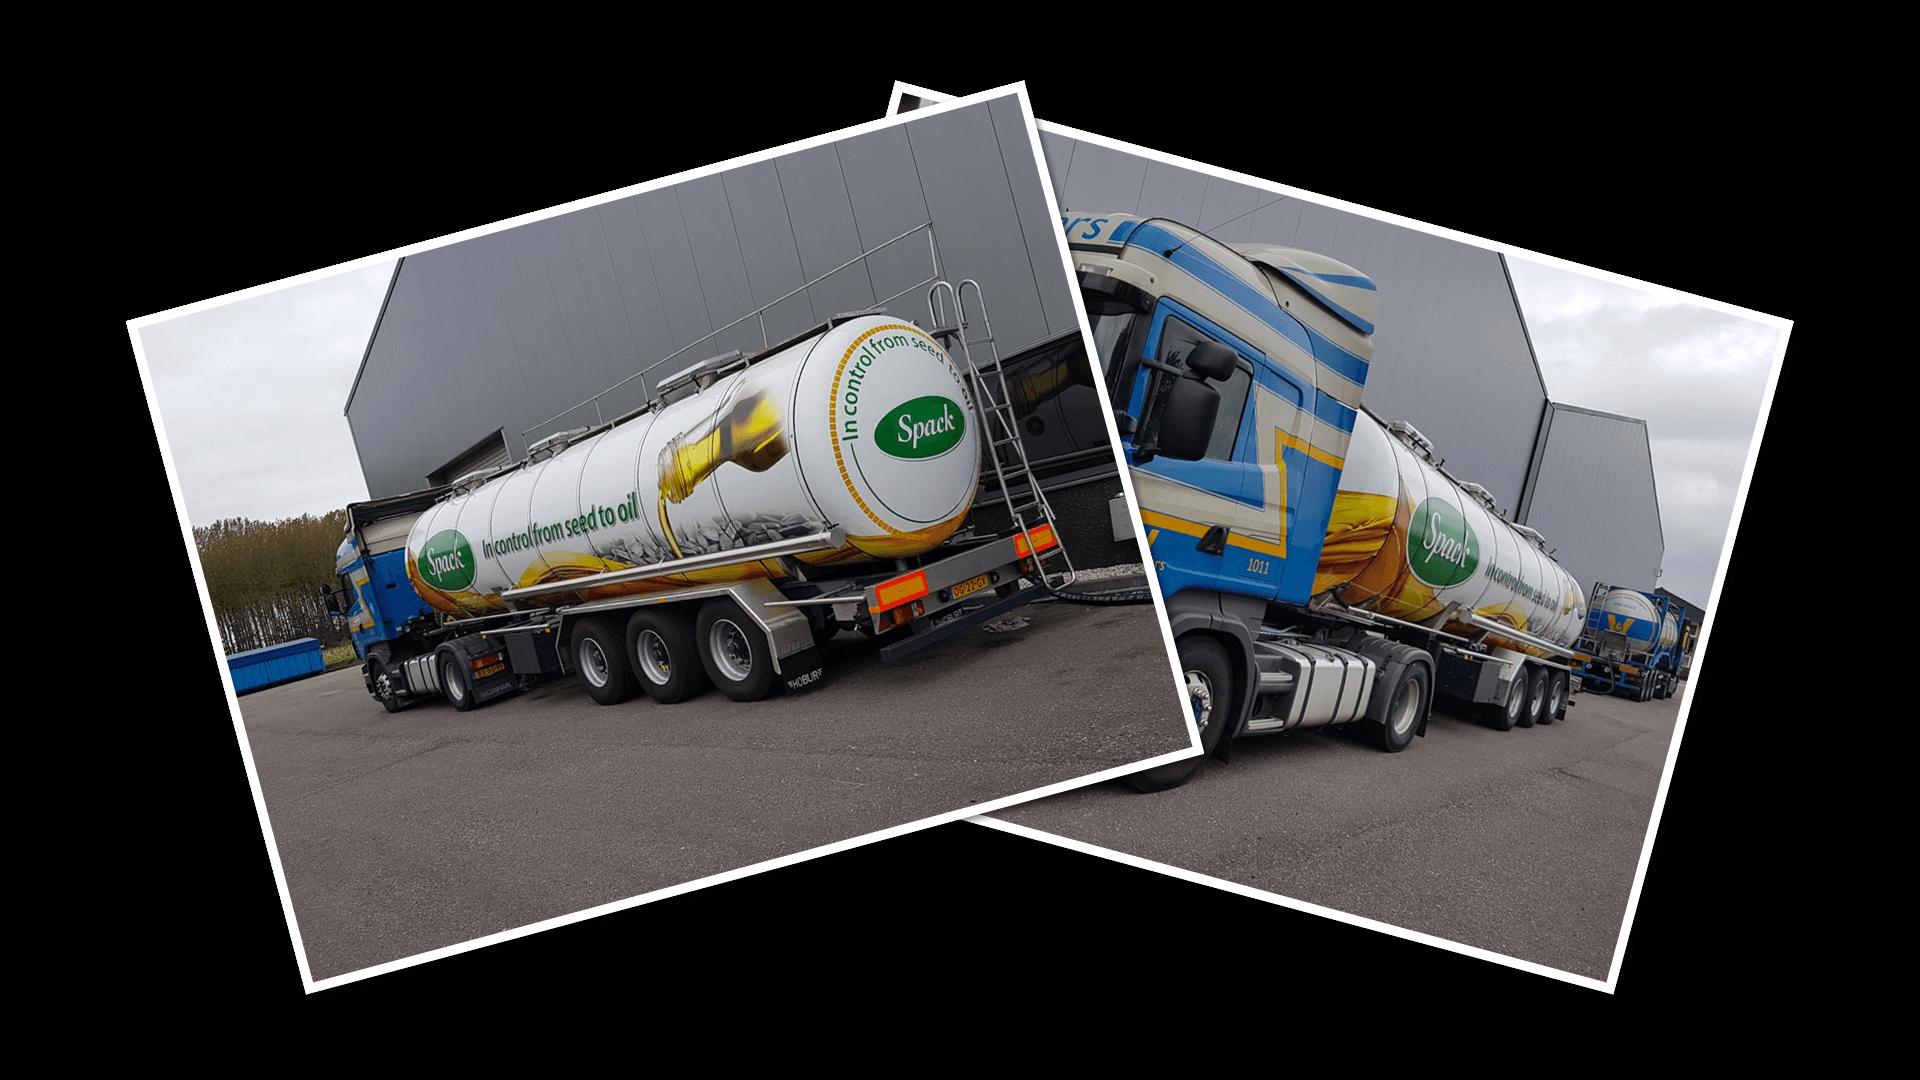 Spack BV vrachtwagentrailer signing